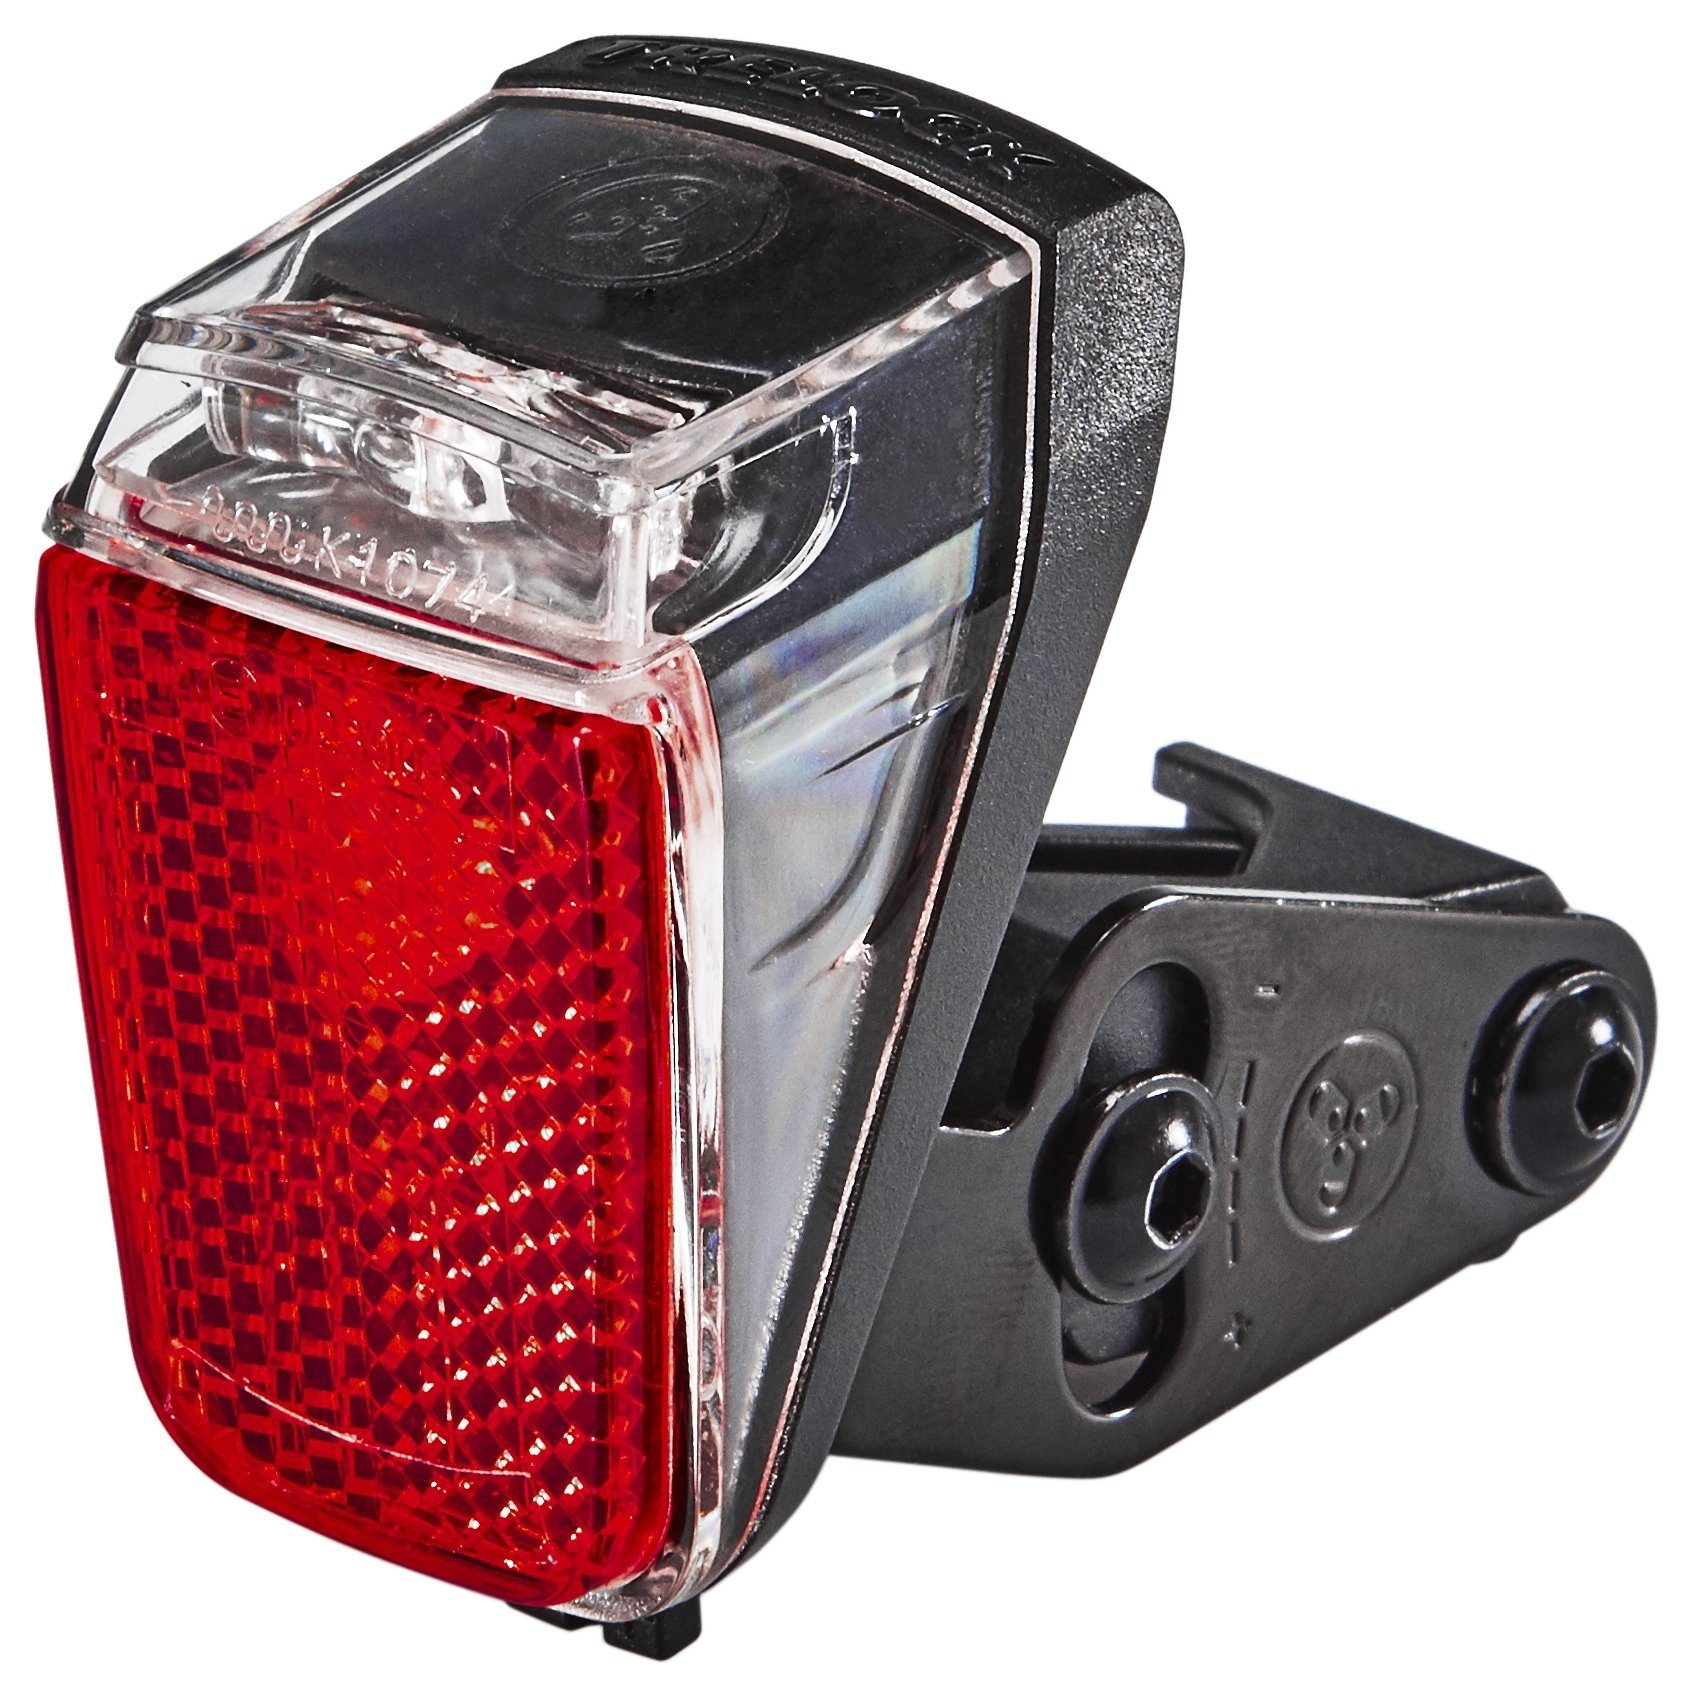 Trelock Fahrradbeleuchtung »LS 633 DUO TOP Rückleuchte«